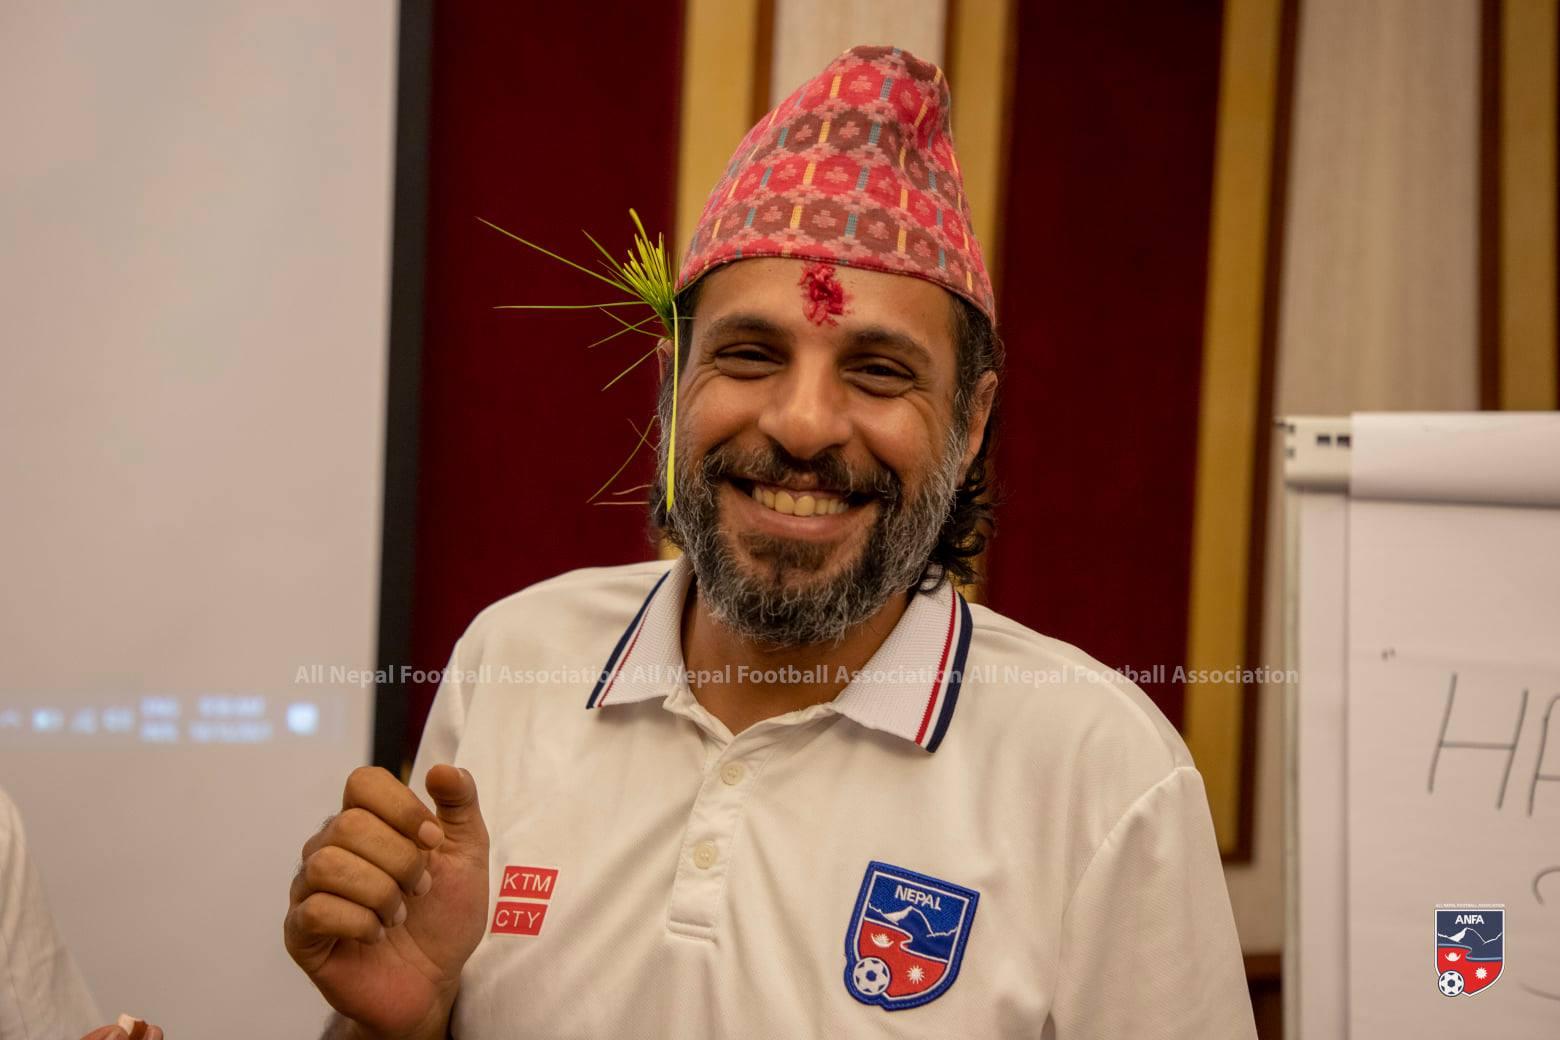 Nepal football coach Abdullah Almutairi shows readiness to return to Nepal